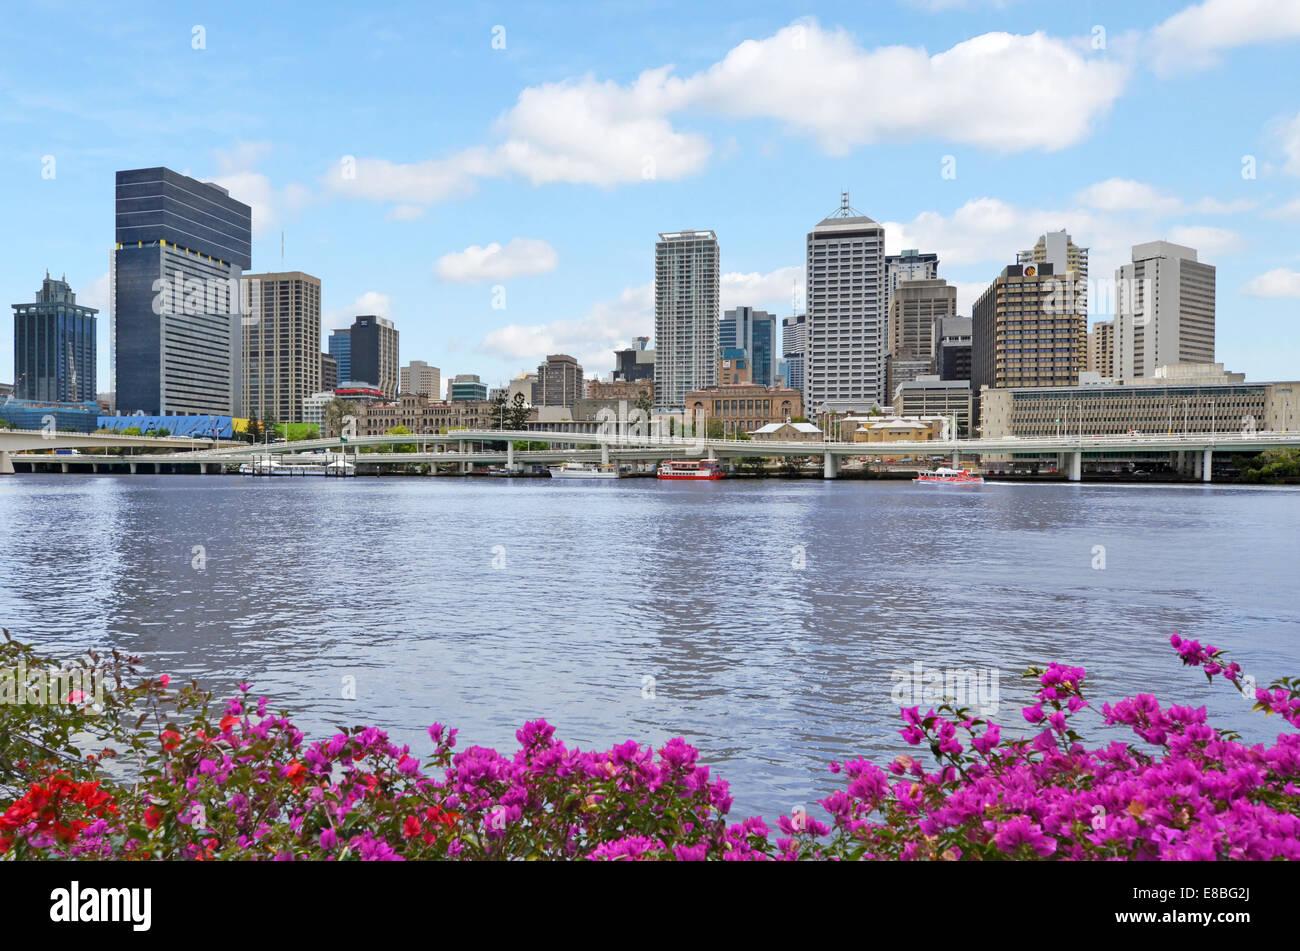 BRISBANE, AUS - SEP 24 2014:Brisbane Skyline.It's Queenslands administrative, educational, and cultural capital. - Stock Image